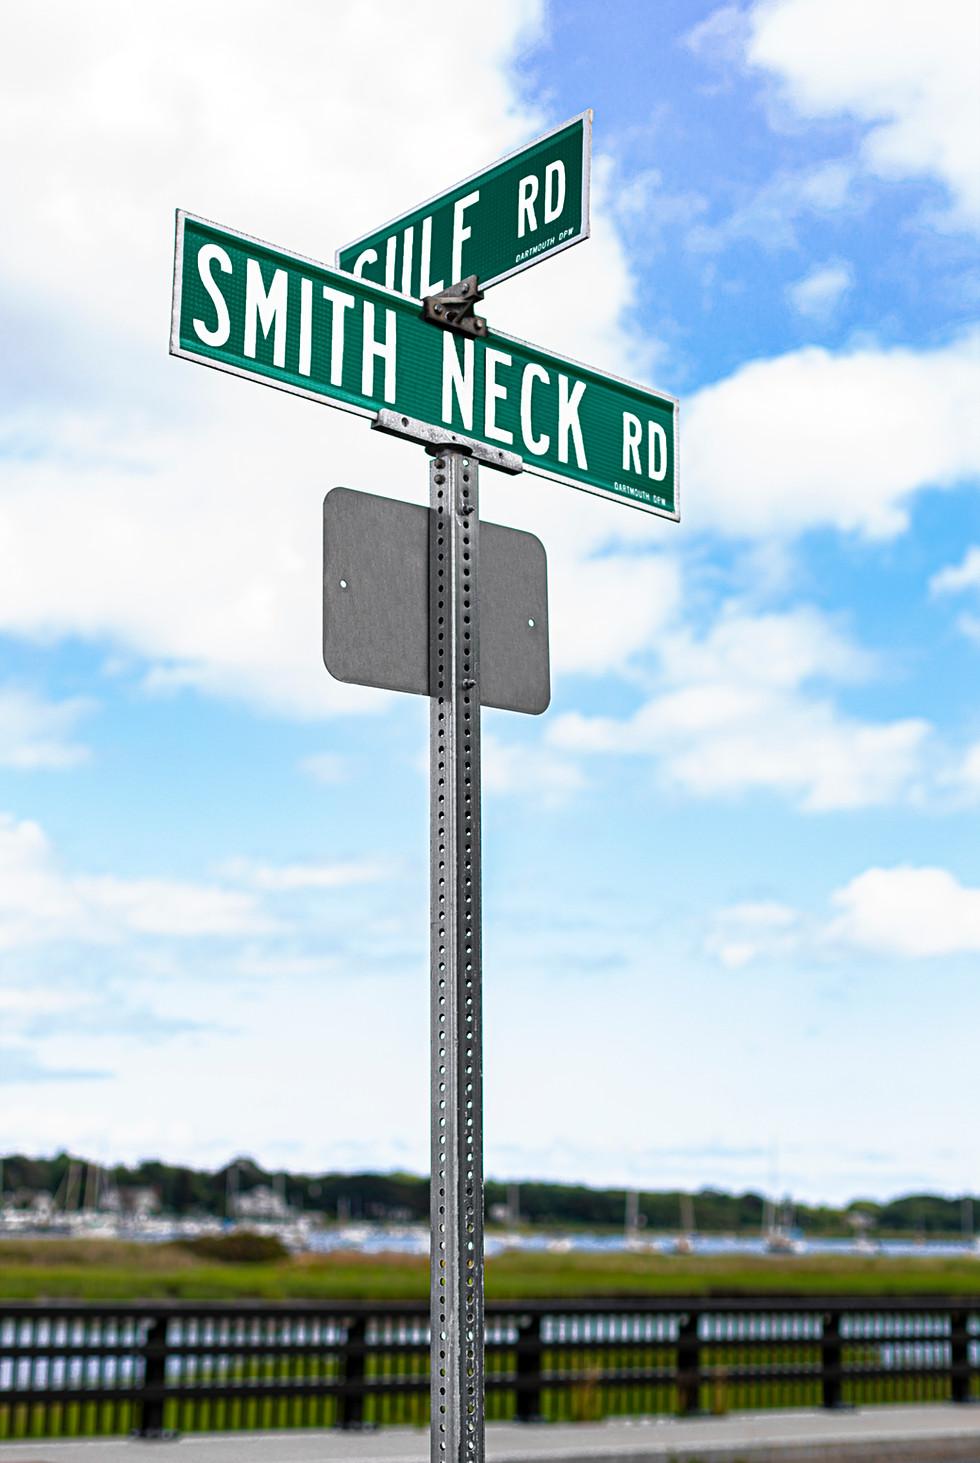 _05A0343-Pano Smith Neck & Gulf Rd.jpg